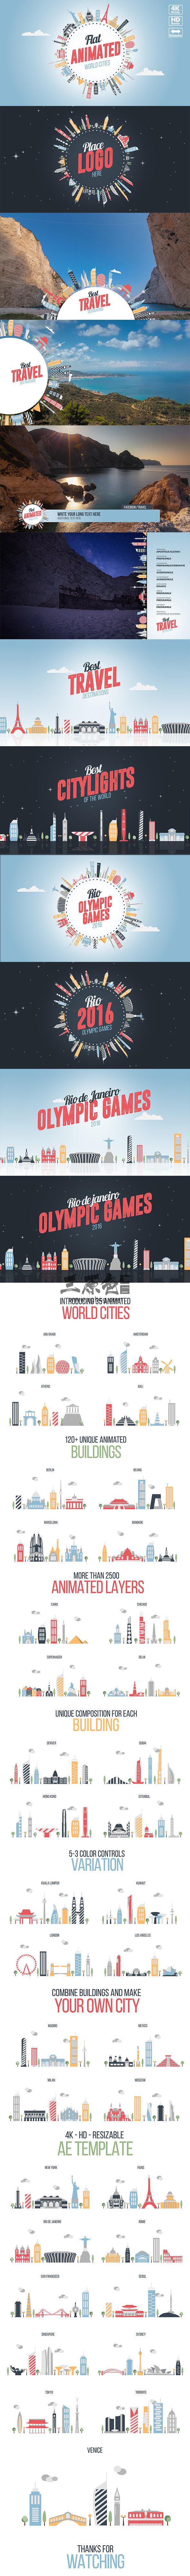 AE模板 MG卡通图形平面动画世界城市建筑 Flat World Cities Ae 模板-第1张